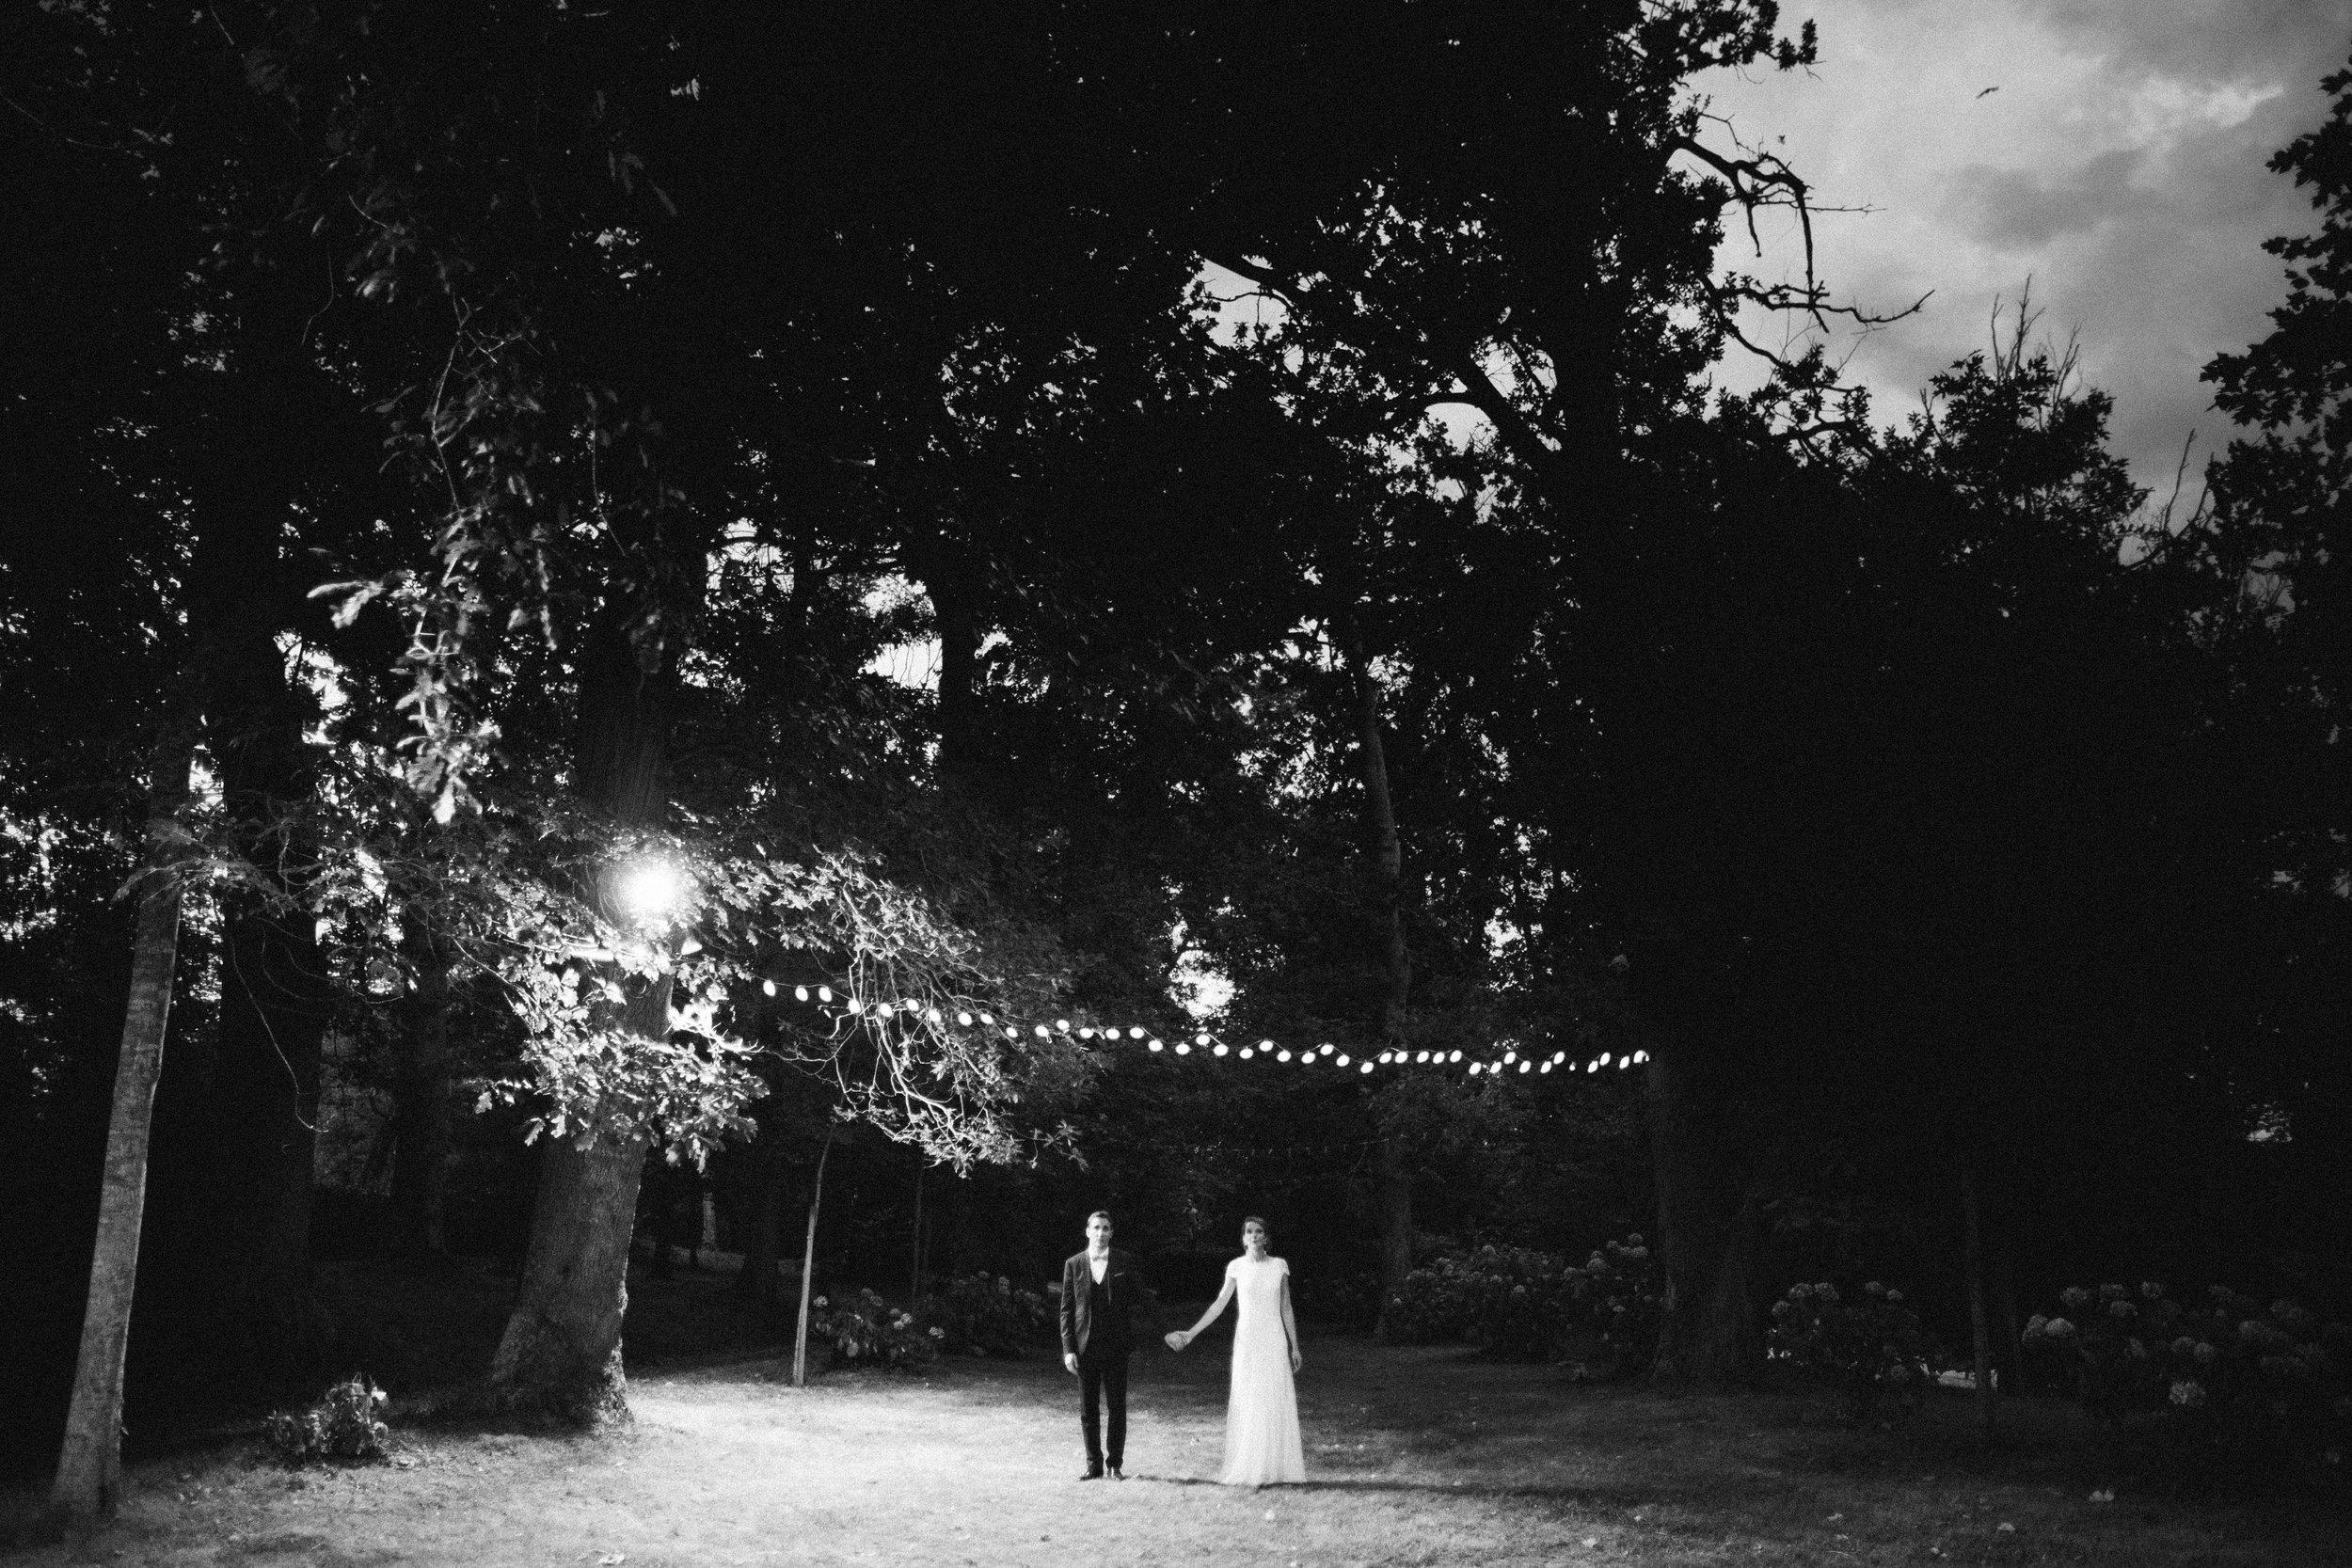 celinehamelin-photographe-mariage-landes-wedding-southwest-photography-film-photographer-argentique19.jpg